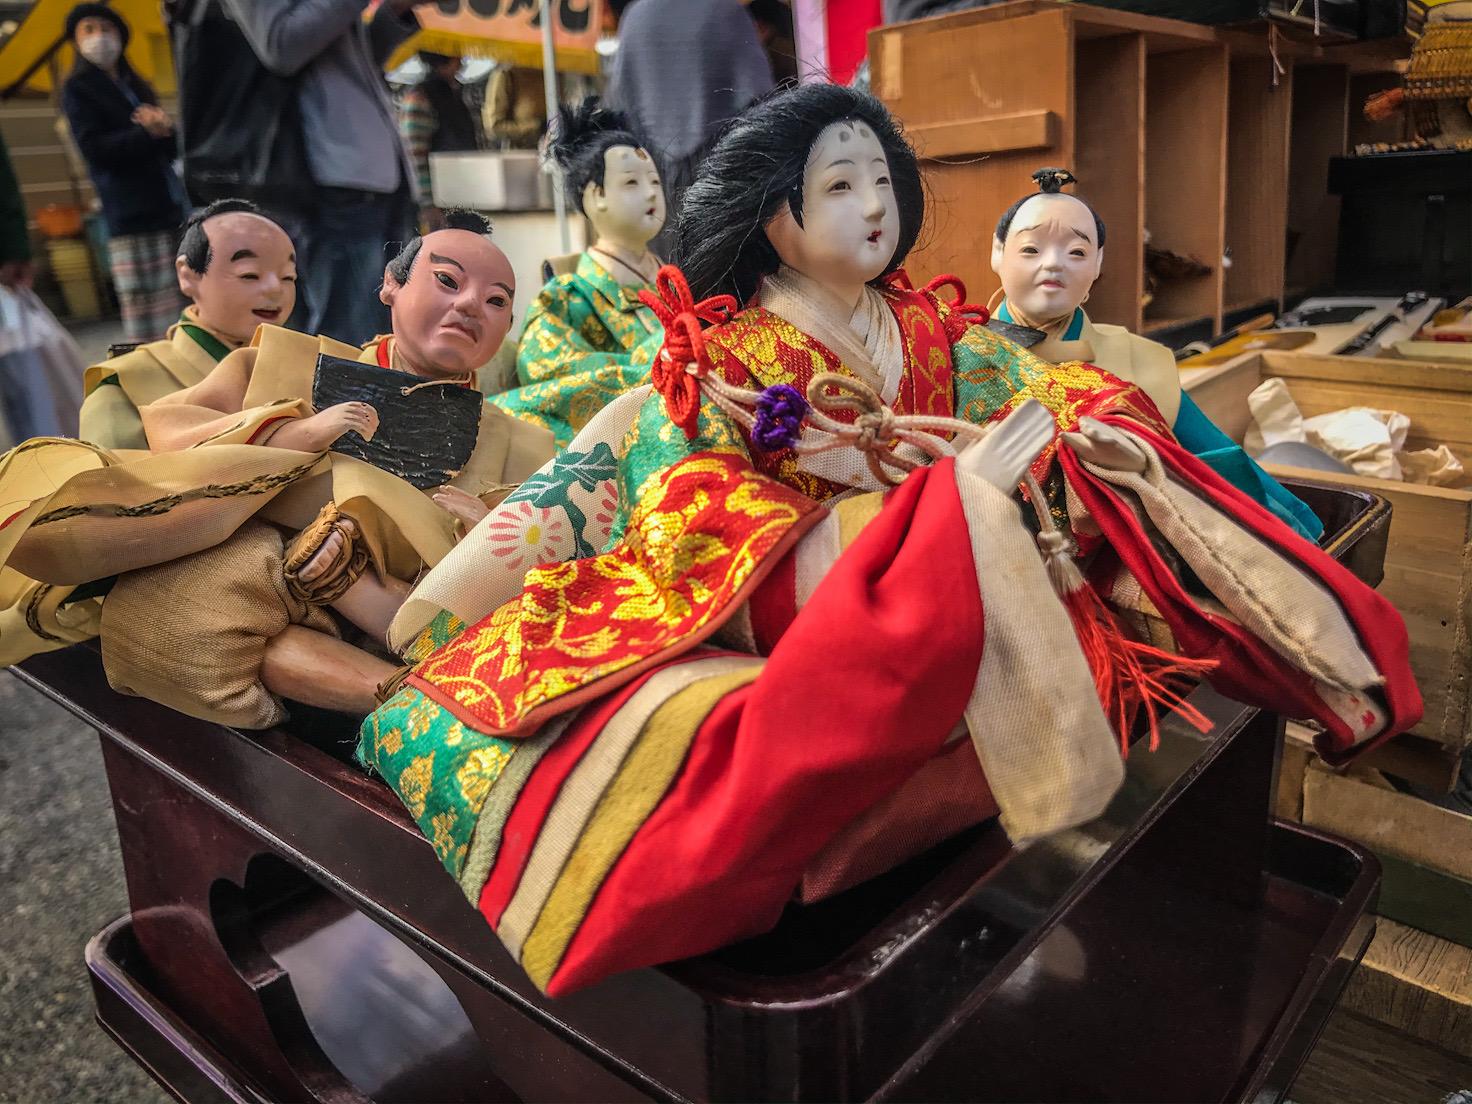 old hina dolls